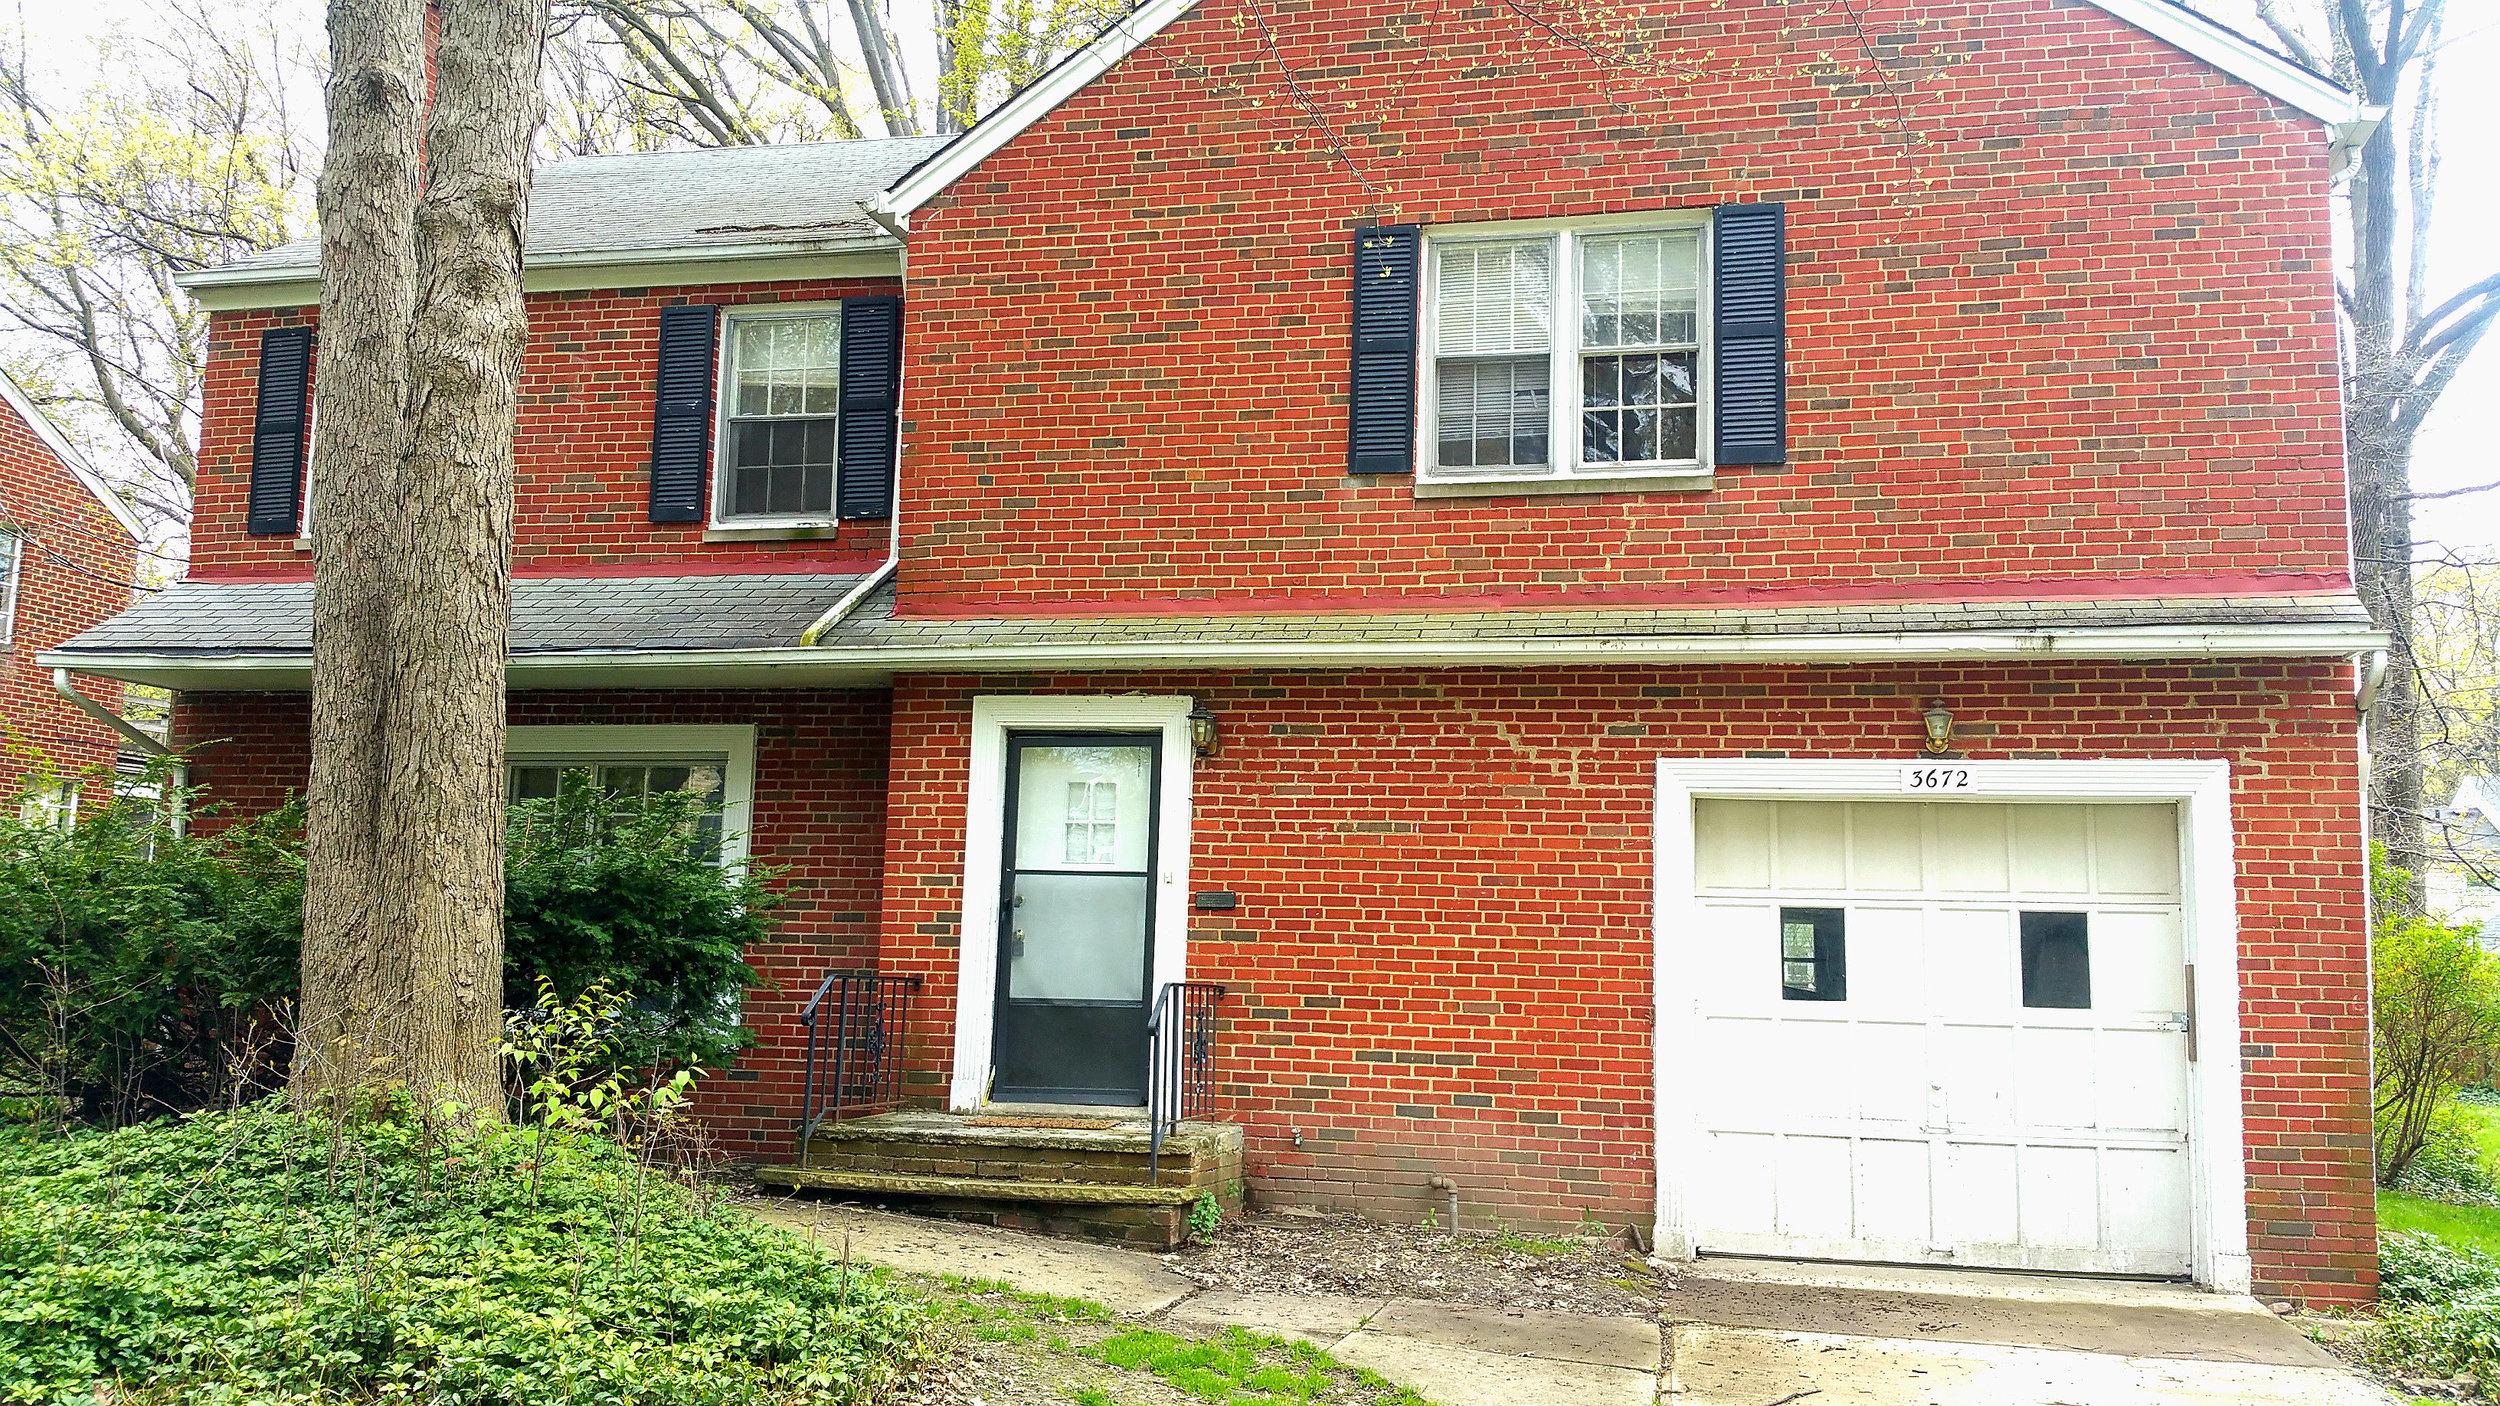 3672 Fenley Rd., Cleveland Hts. | 3 bed 2 bath | 1,967 Sq. Ft. | $36,000